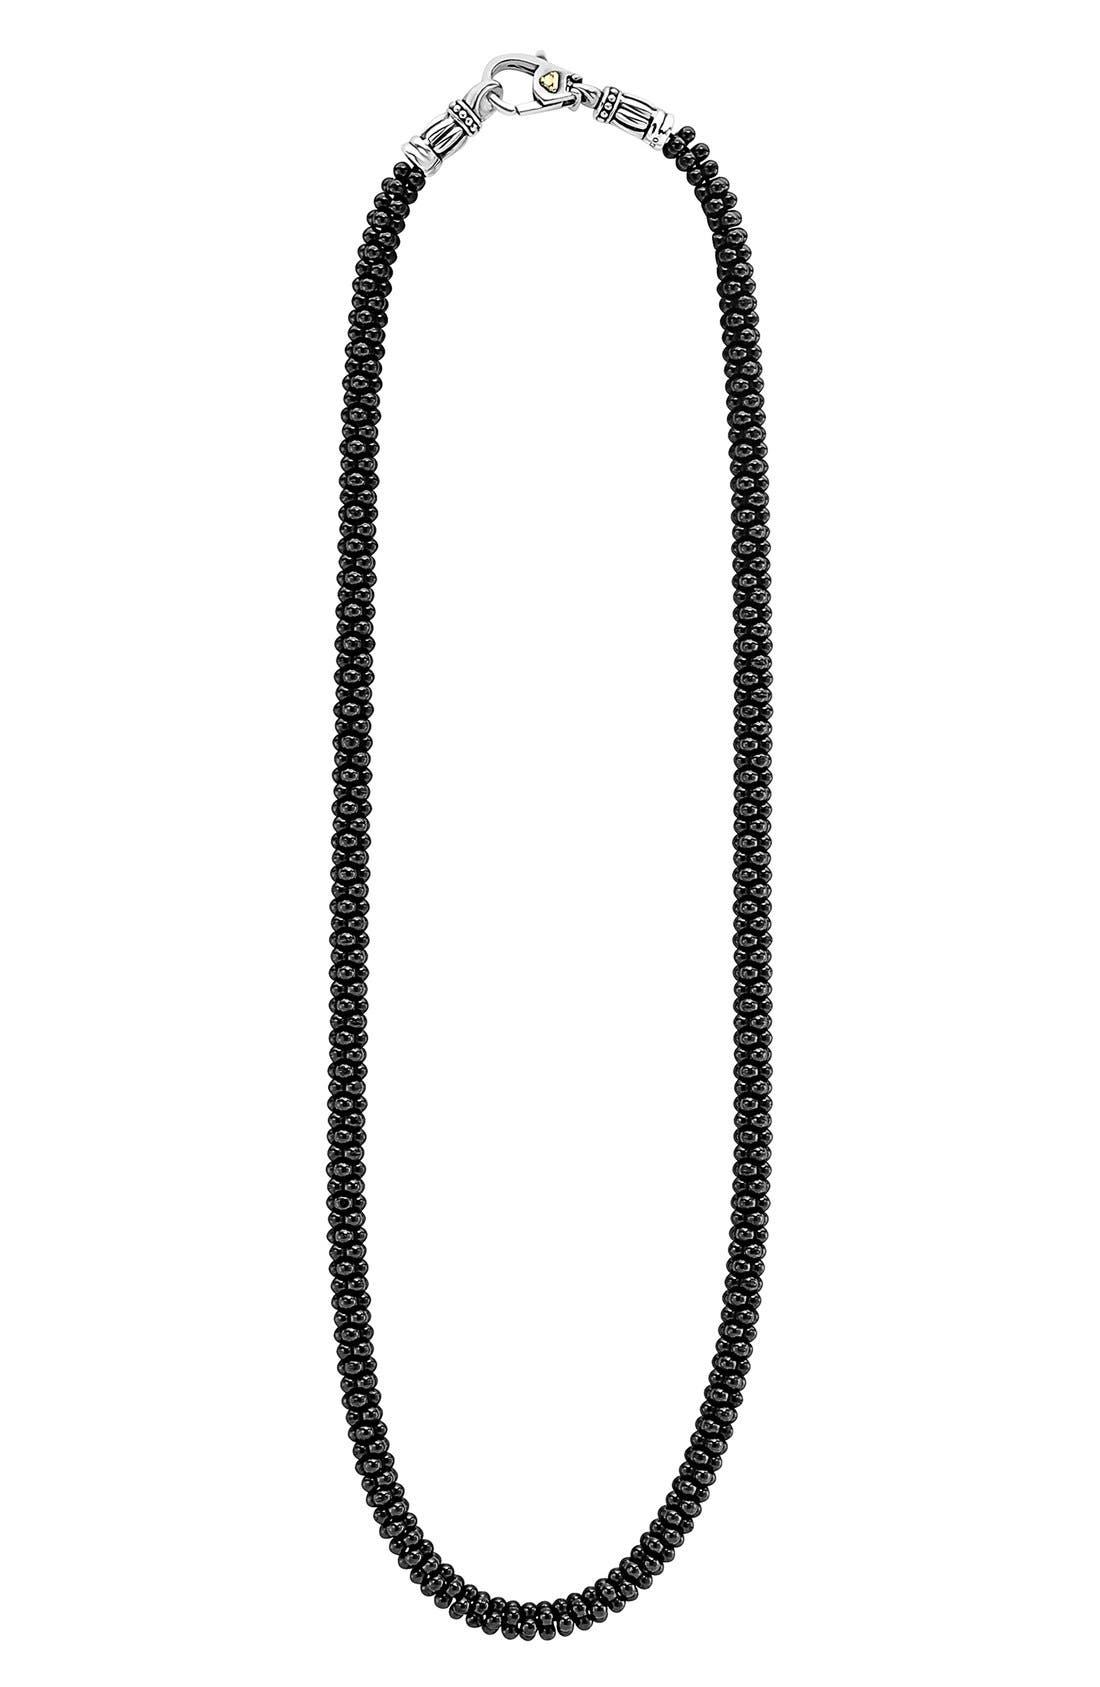 'Black Caviar' 5mm Beaded Necklace,                         Main,                         color, Black Caviar